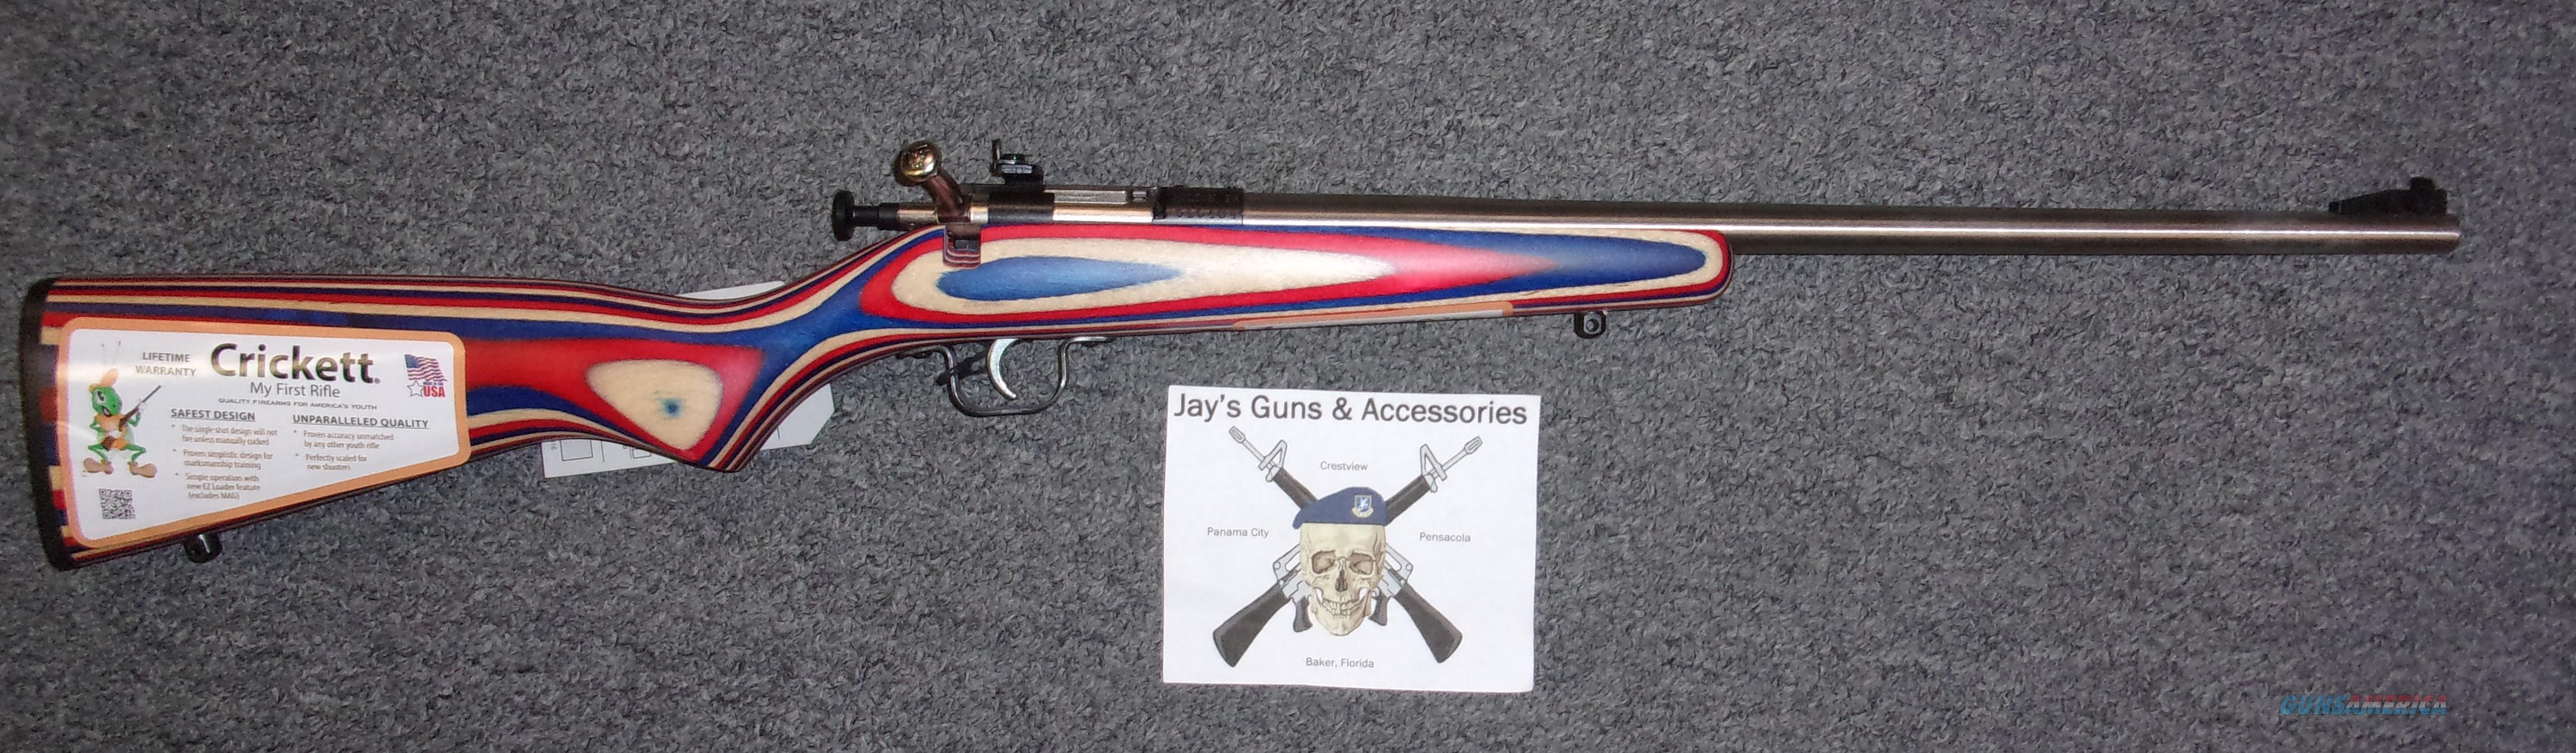 Keystone Arms Crickett (KSA3253) w/Red, White & Blue Laminated Stock  Guns > Rifles > Crickett-Keystone Rifles